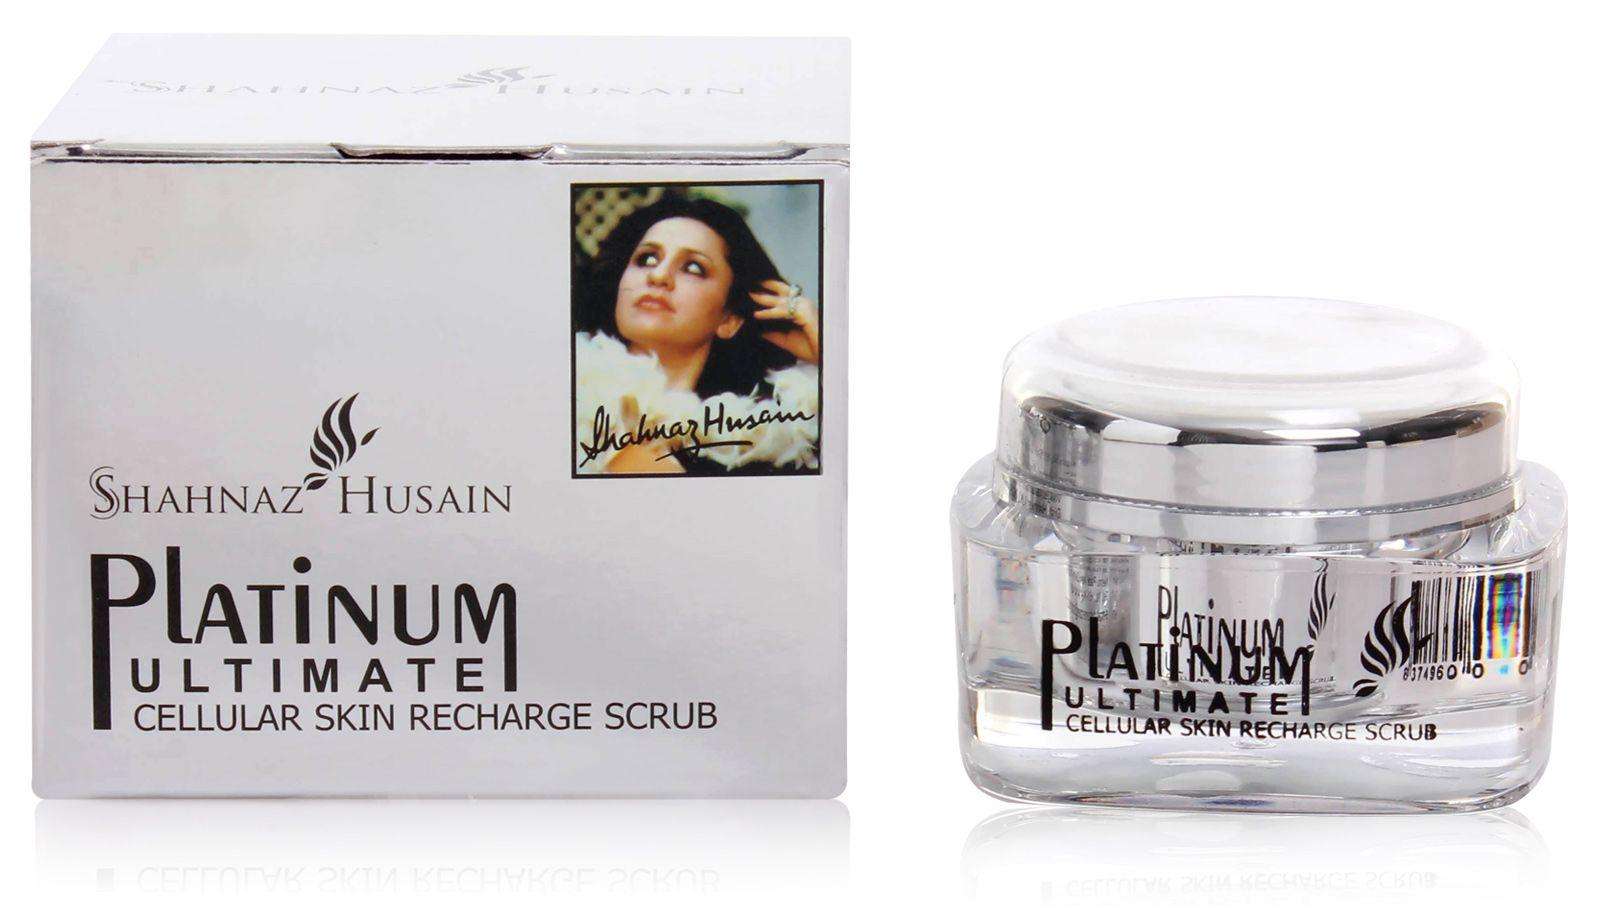 Buy Shahnaz Husain Platinum Ultimate Cellular Skin Recharge Scrub Online FR